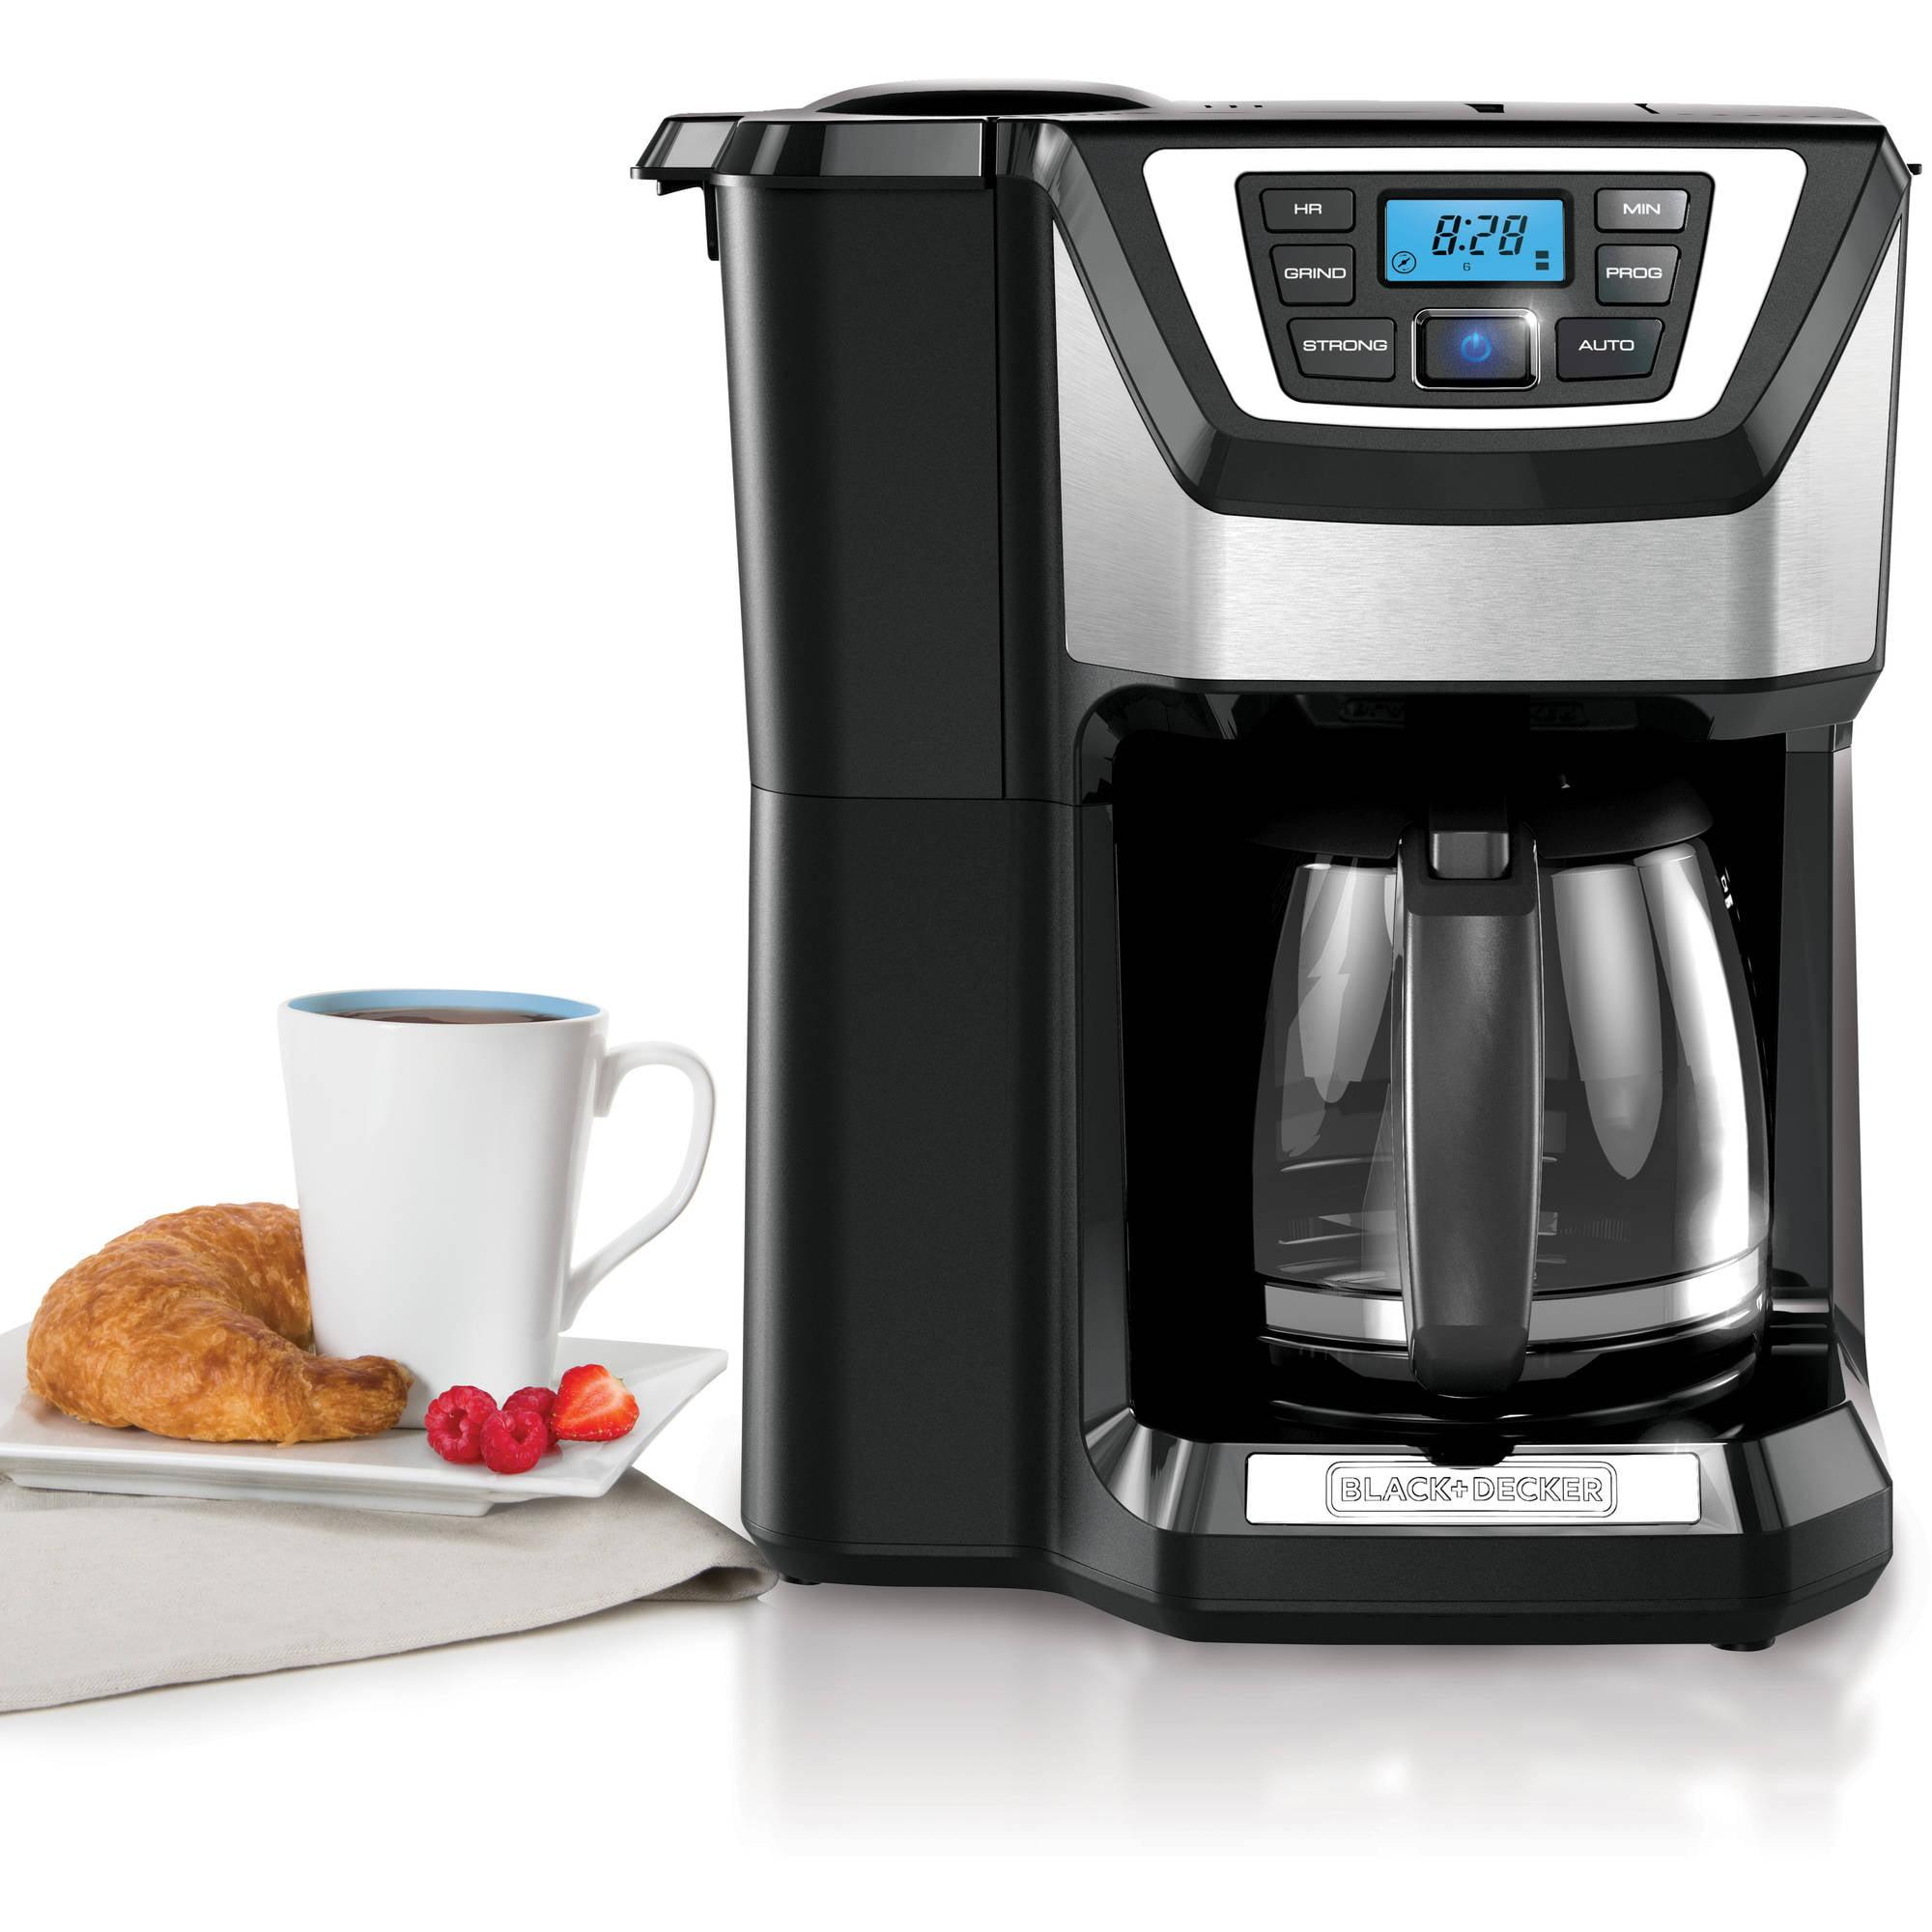 Uncategorized Black & Decker Kitchen Appliances blackdecker mill and brew 12 cup programmable coffee maker with grinder cm5000gd walmart com